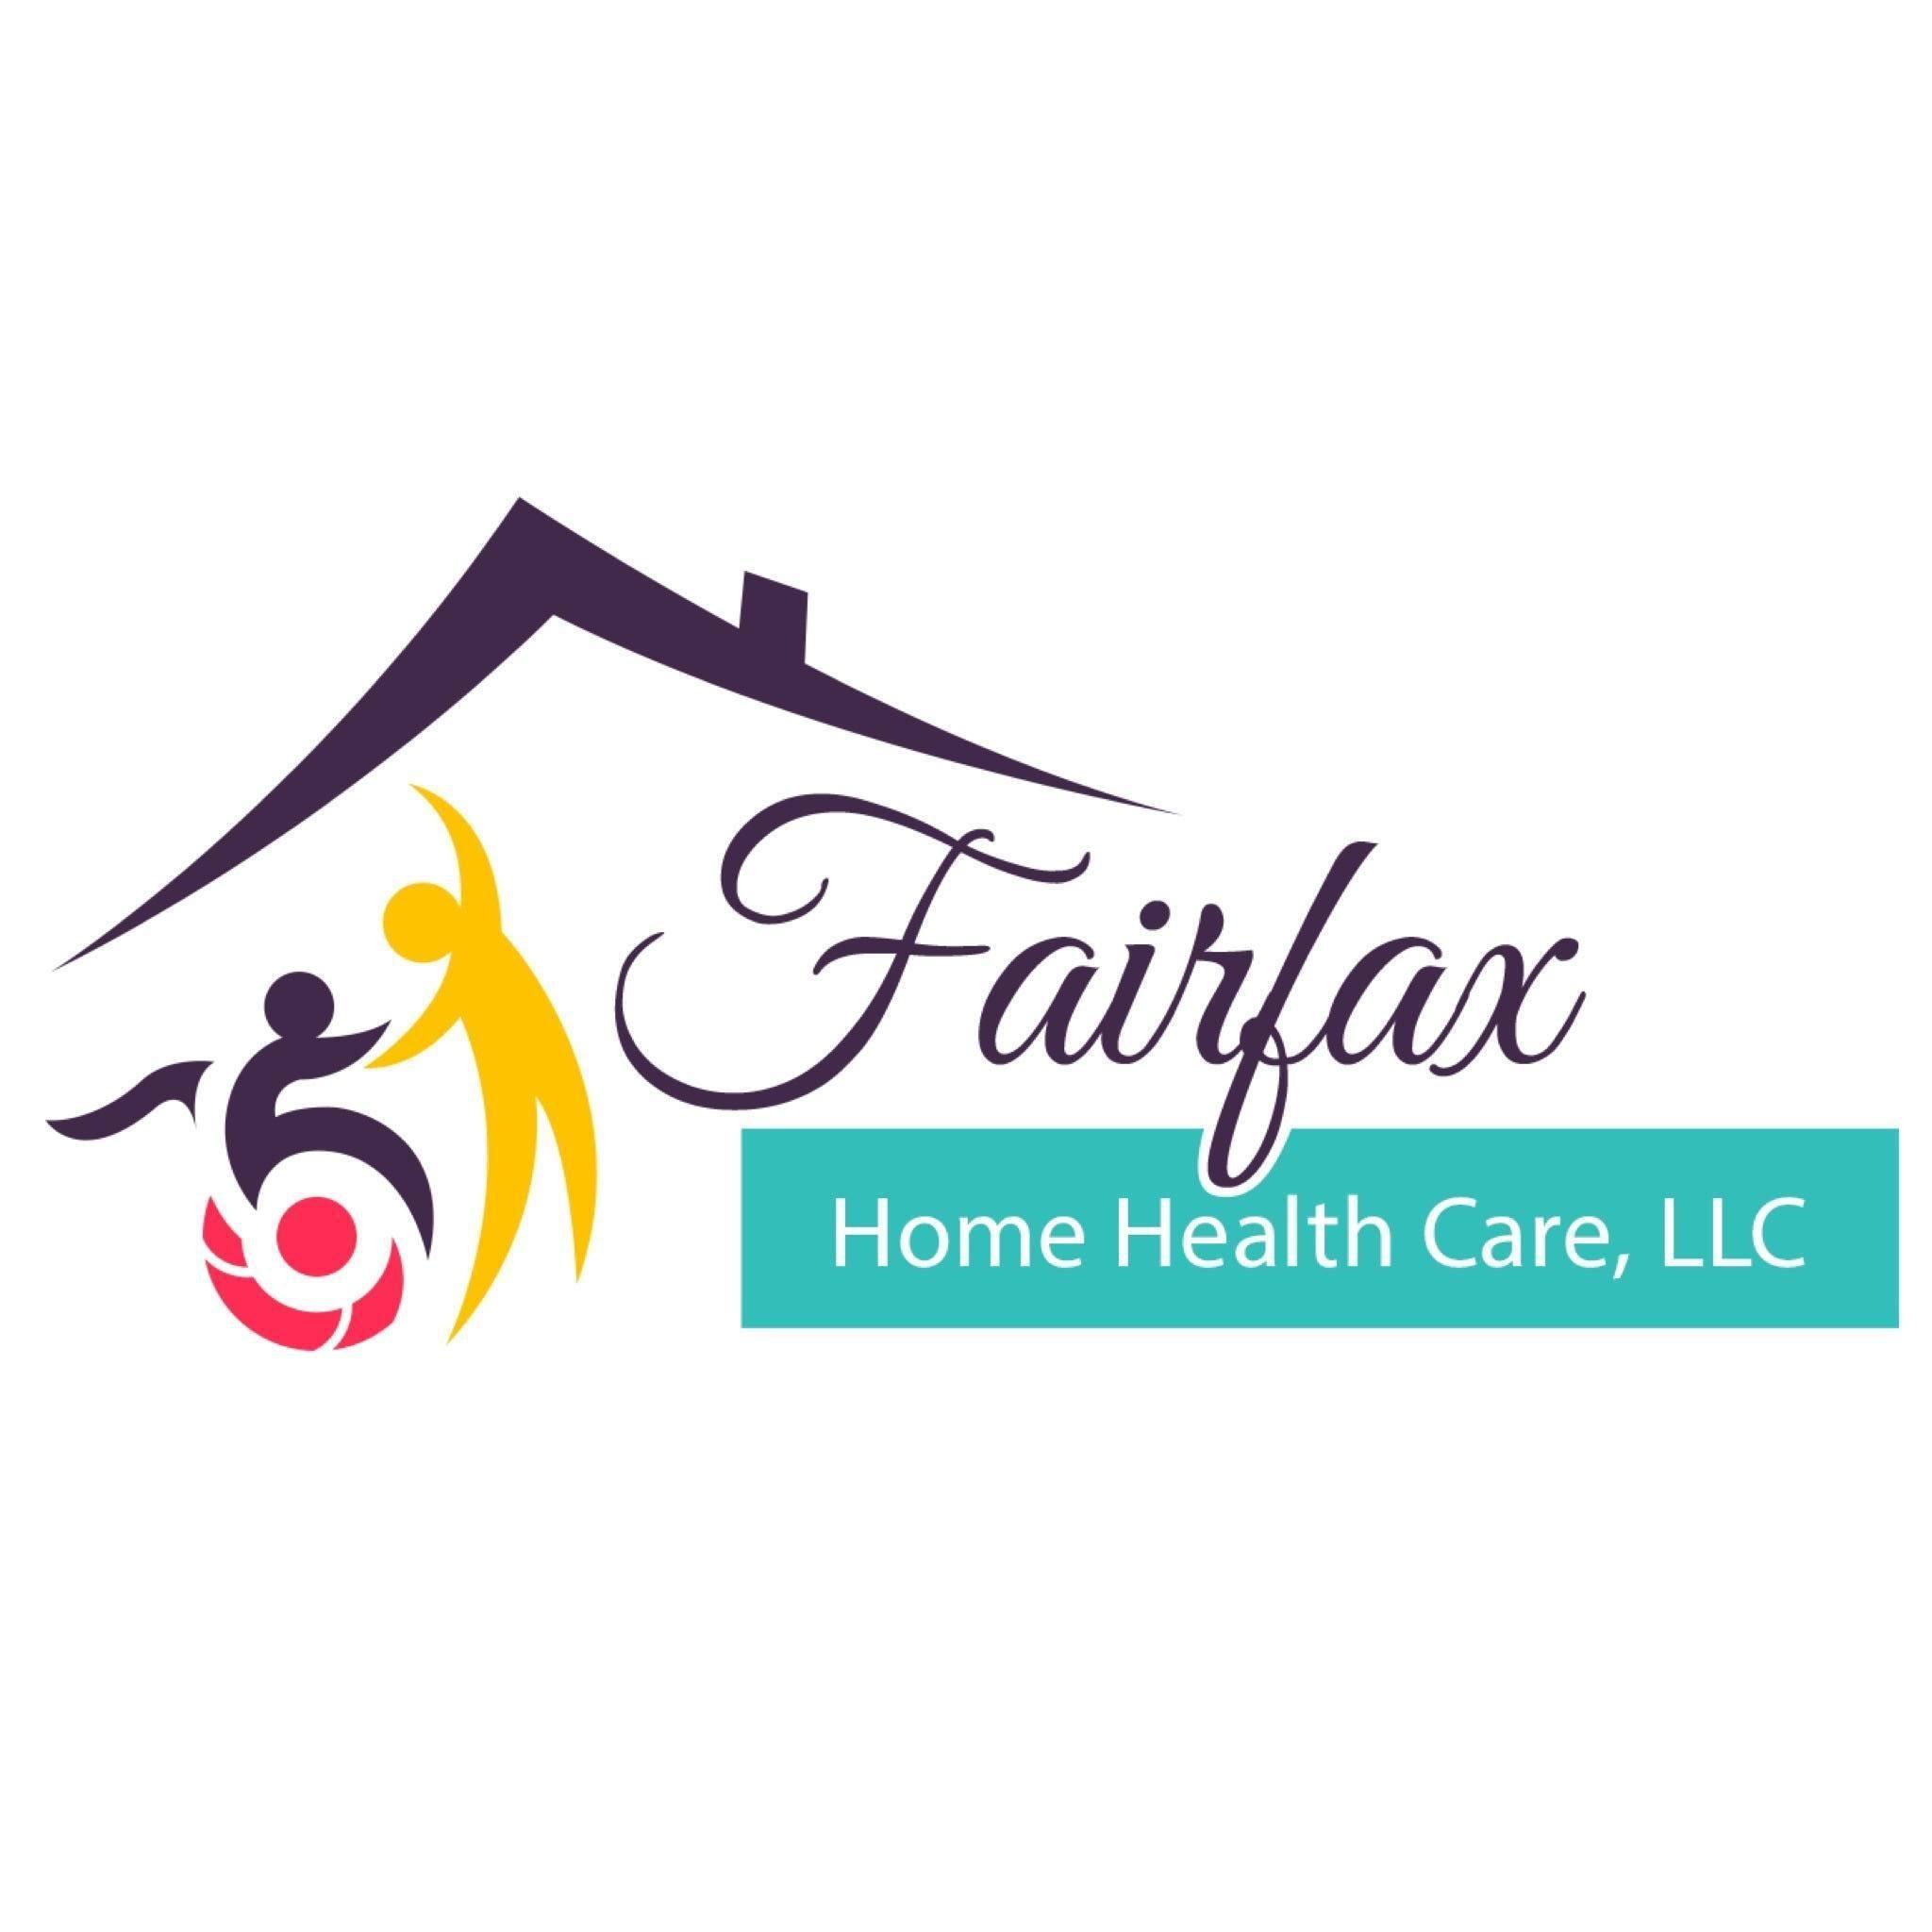 Fairfax Home Health Care